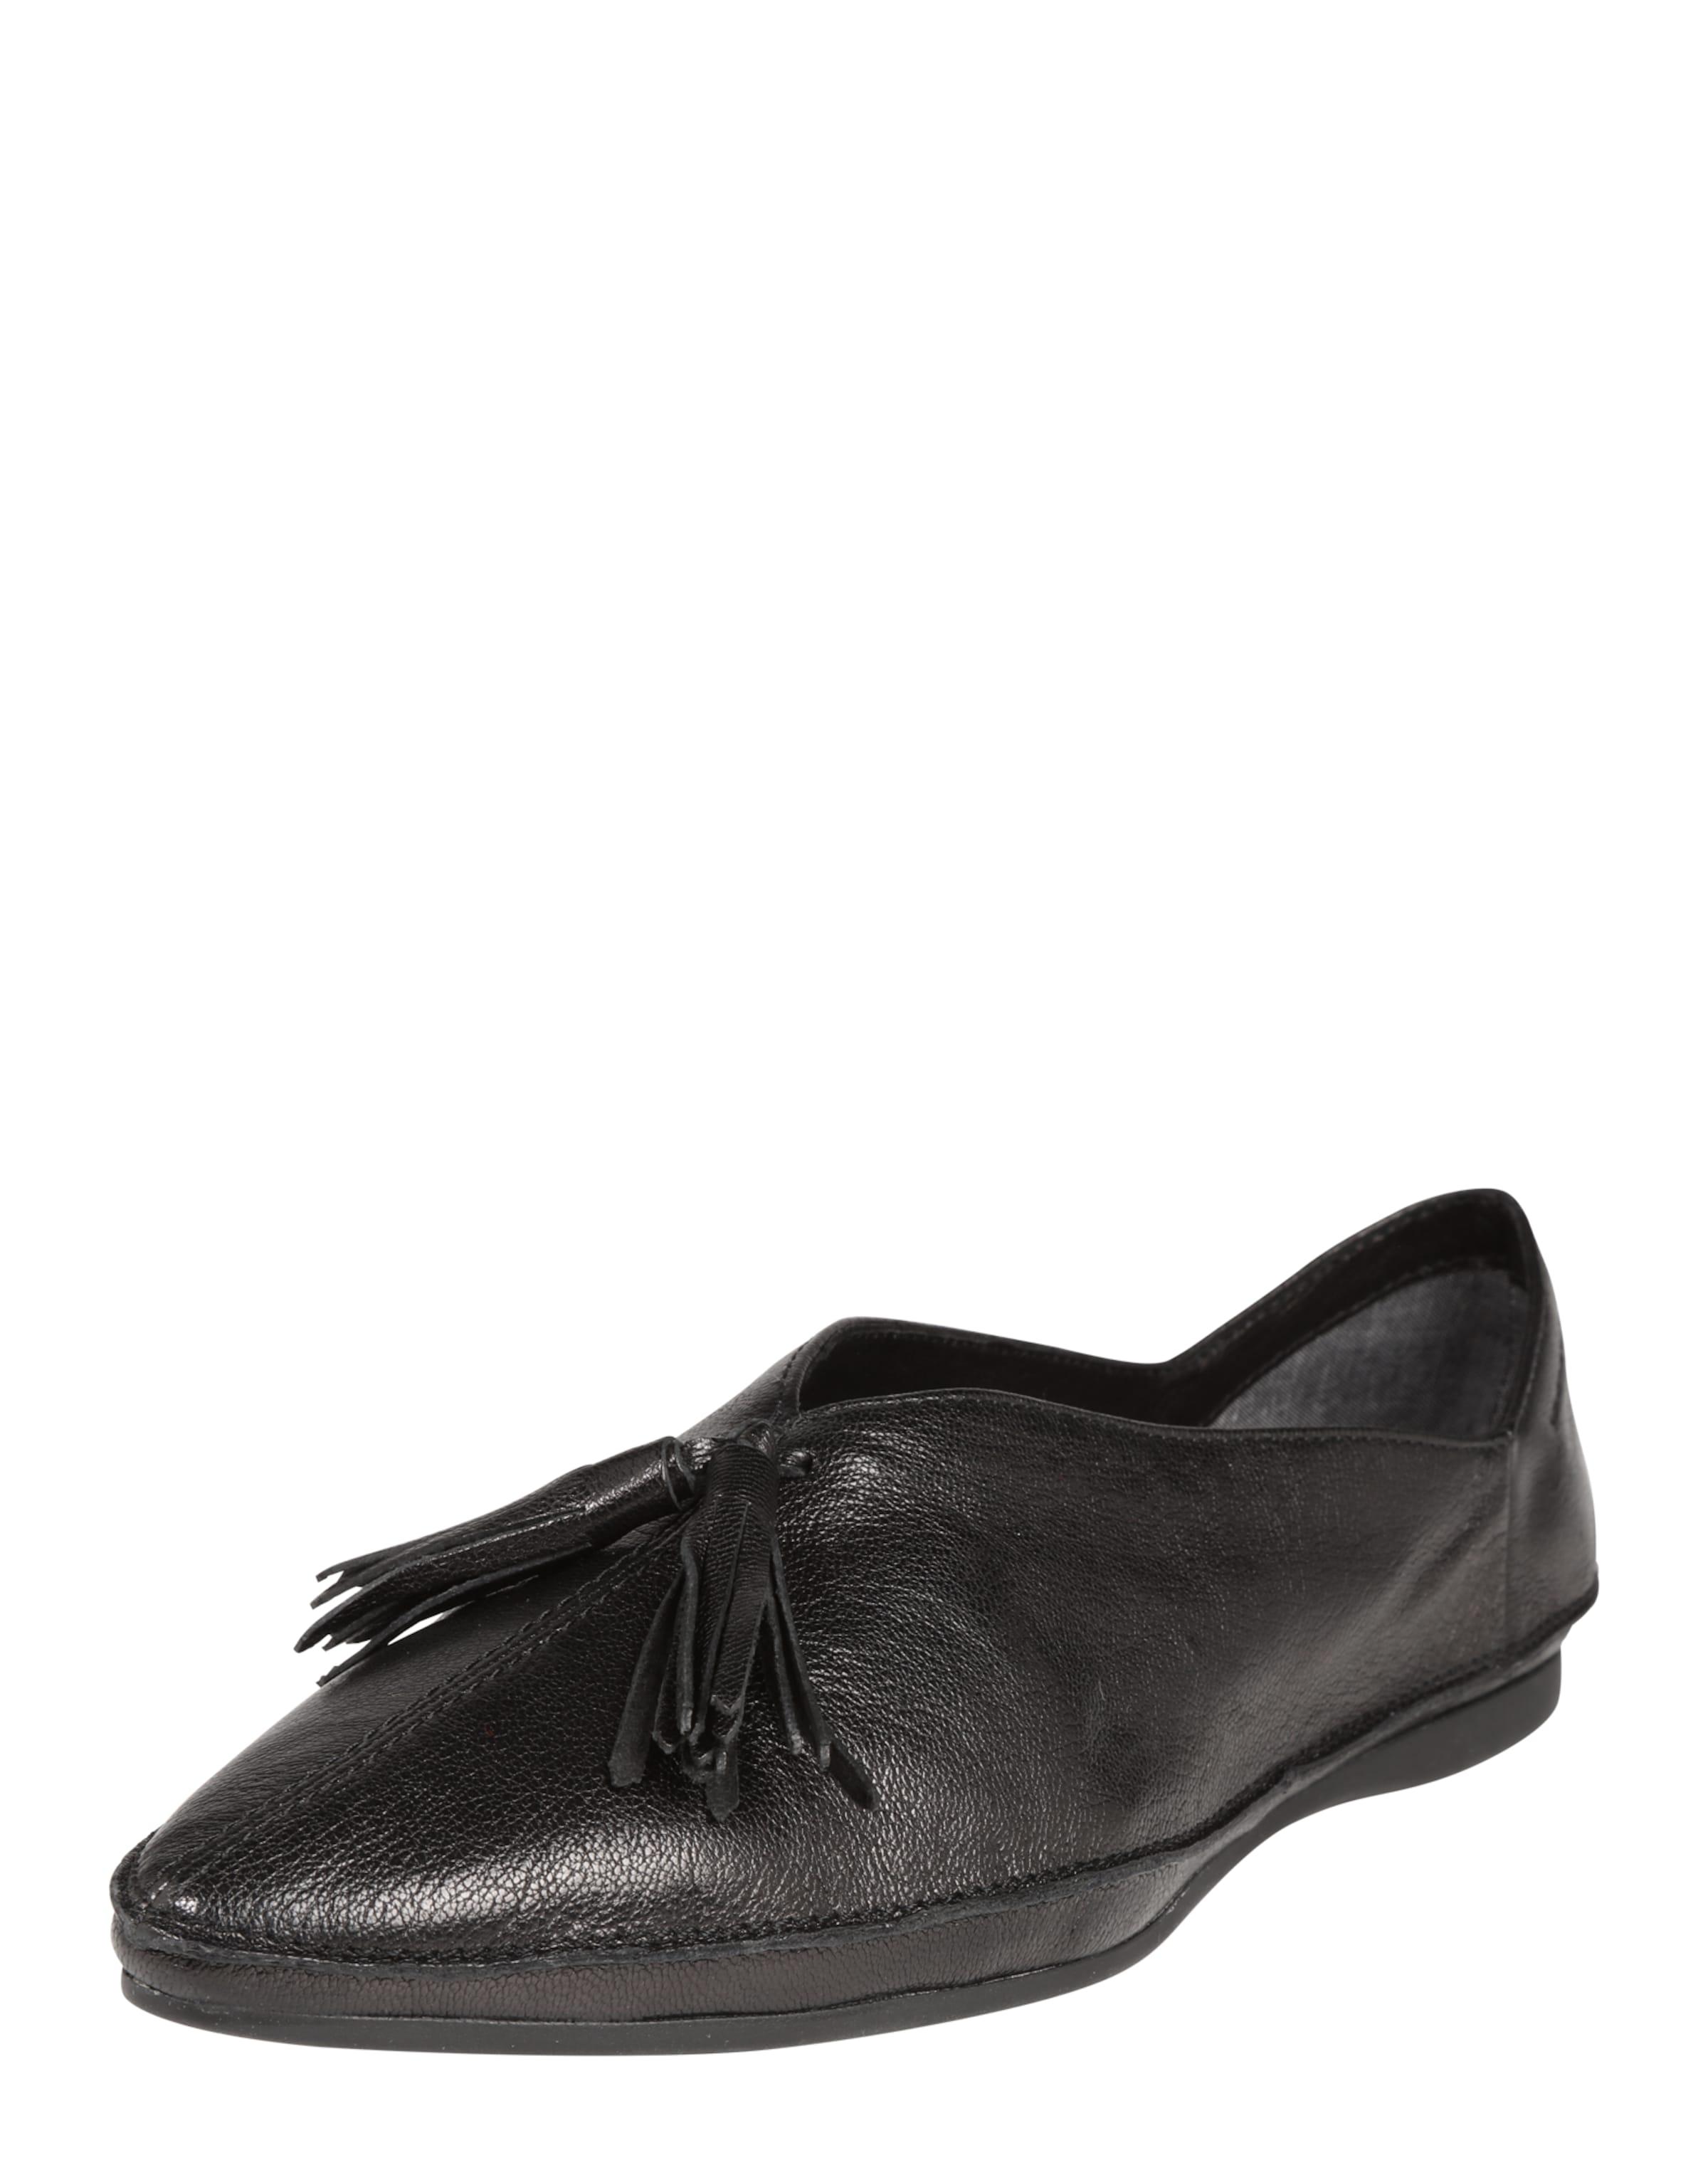 Schwarz In 'antonia' Shoemakers Vagabond Slipper kXiuOPZ